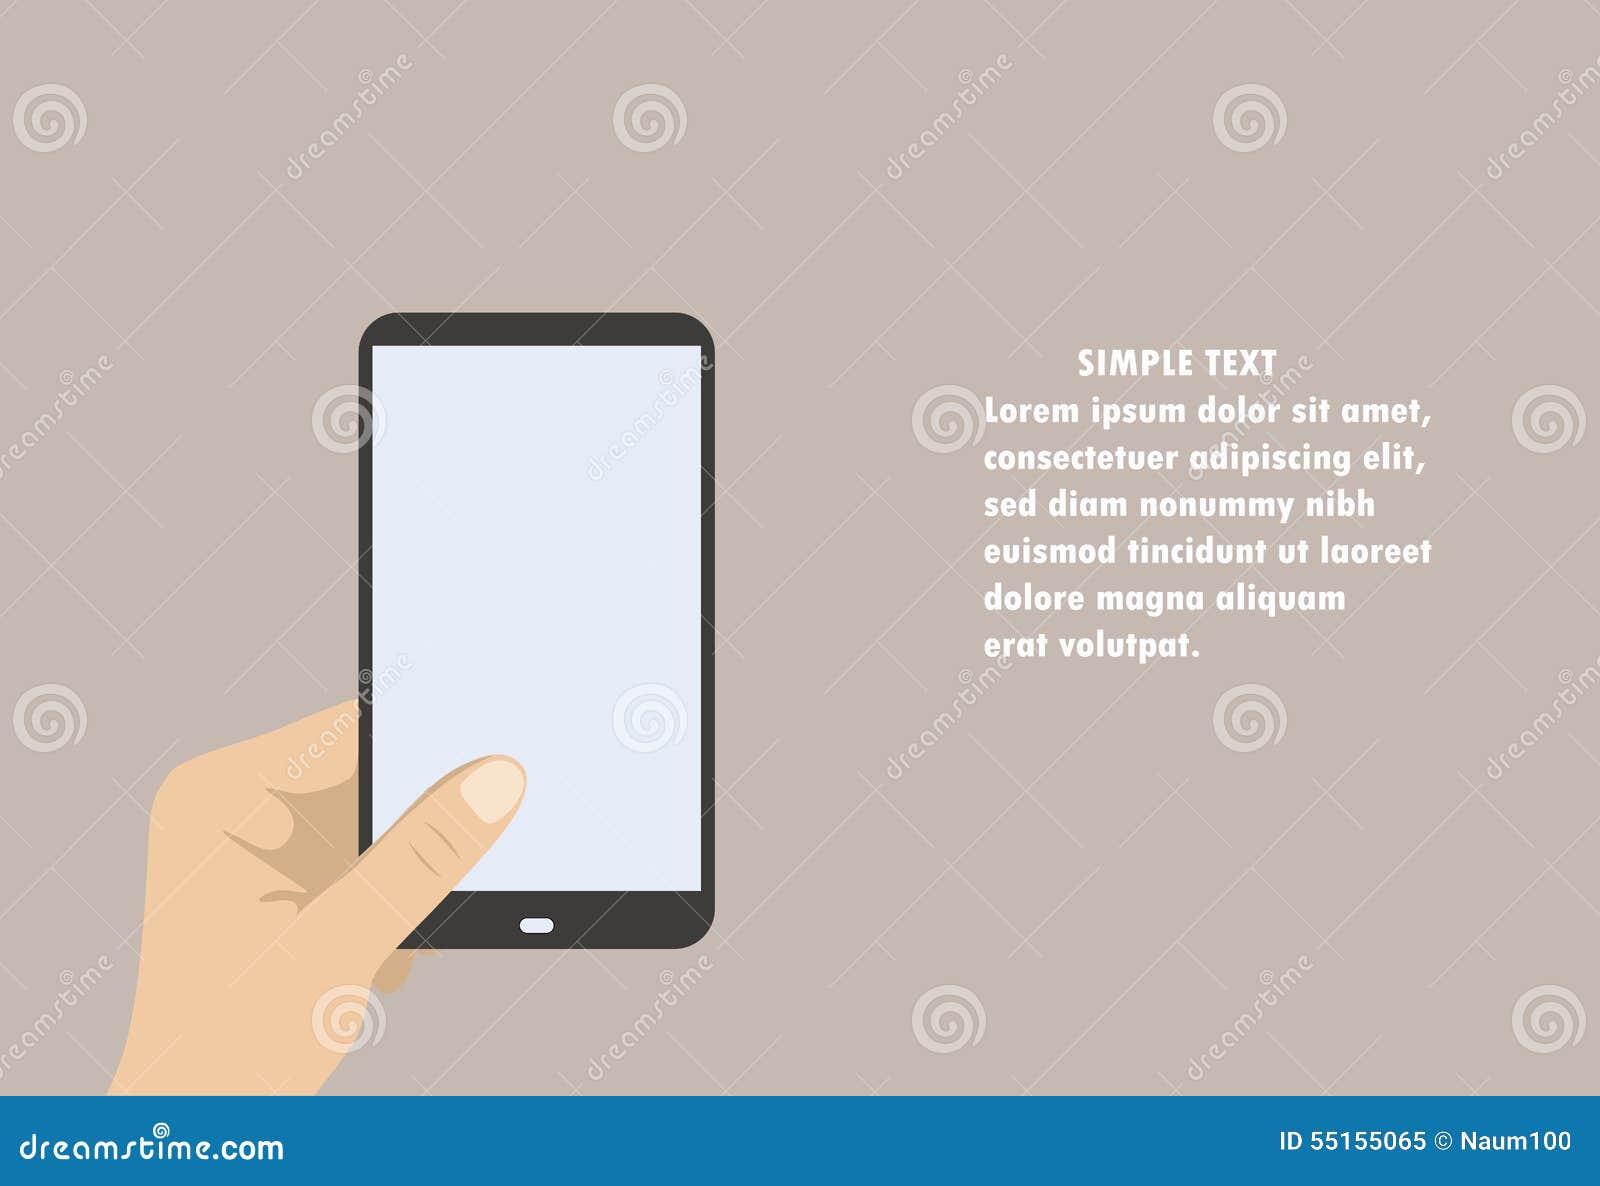 Hand Holding Mobile Phone Illustration Stock Vector ...